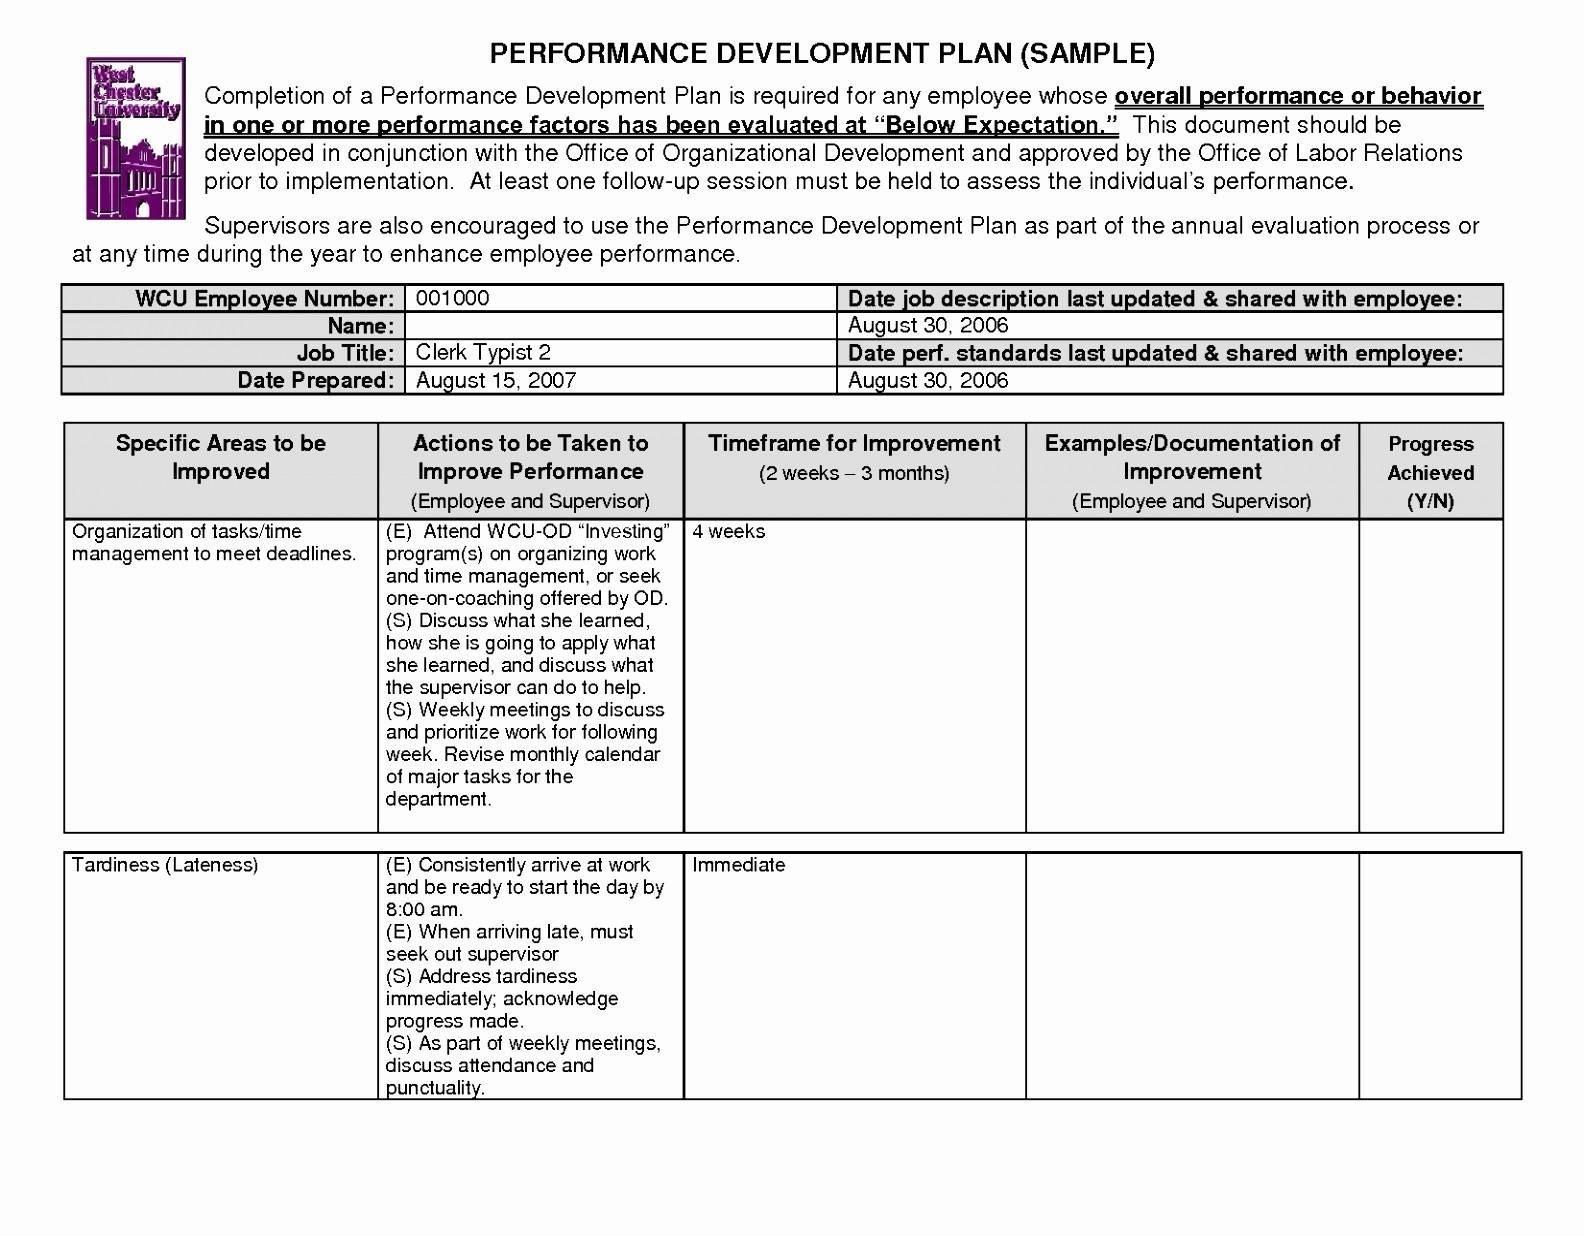 Product Development Business Case Template Valid Free Business For Product Development Business Case Template